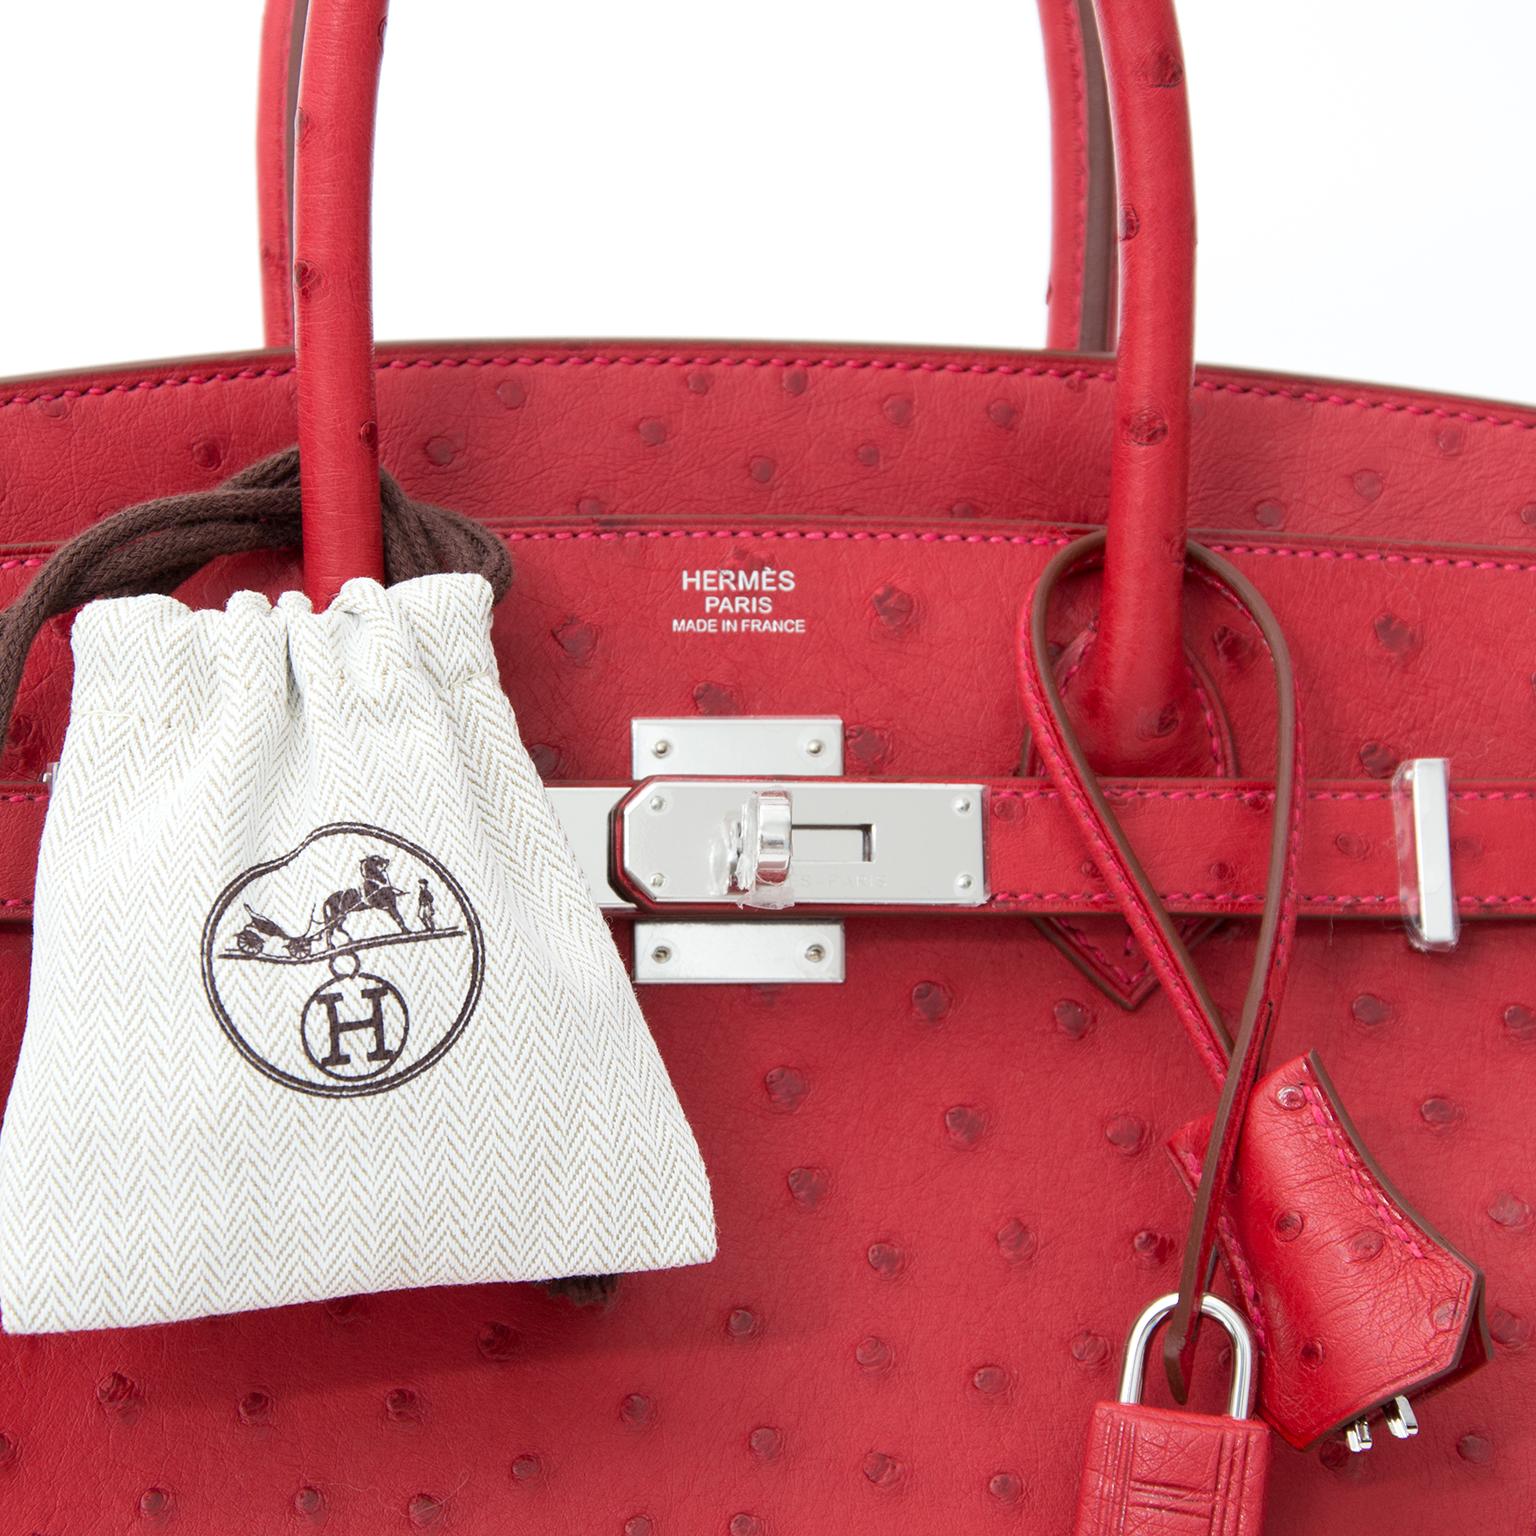 Hermes Ostrich Birkin 30 Rouge Vif Buy authentic secondhand Hermès bags at the right price at LabelLOV vintage webshop. Safe and secure online shopping. Koop authentieke tweedehands Hermès tassen aan de juiste prijs bij LabelLOV webshop.